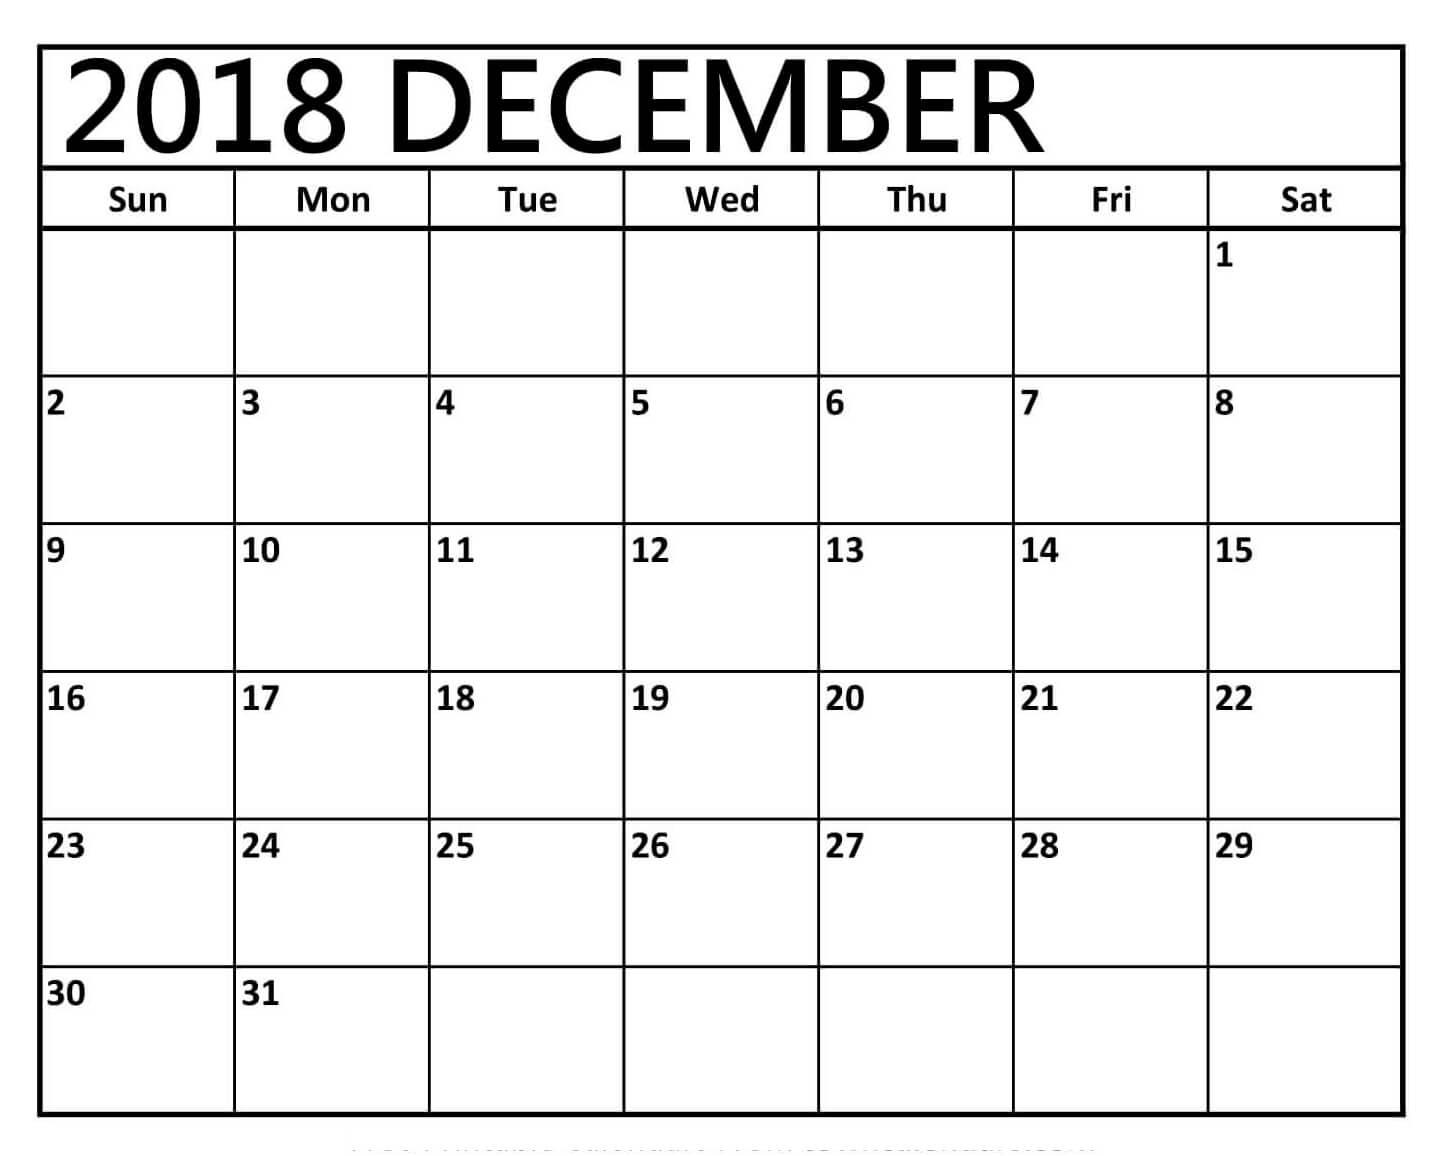 Printable December 2018 Calendar Word - Printable December